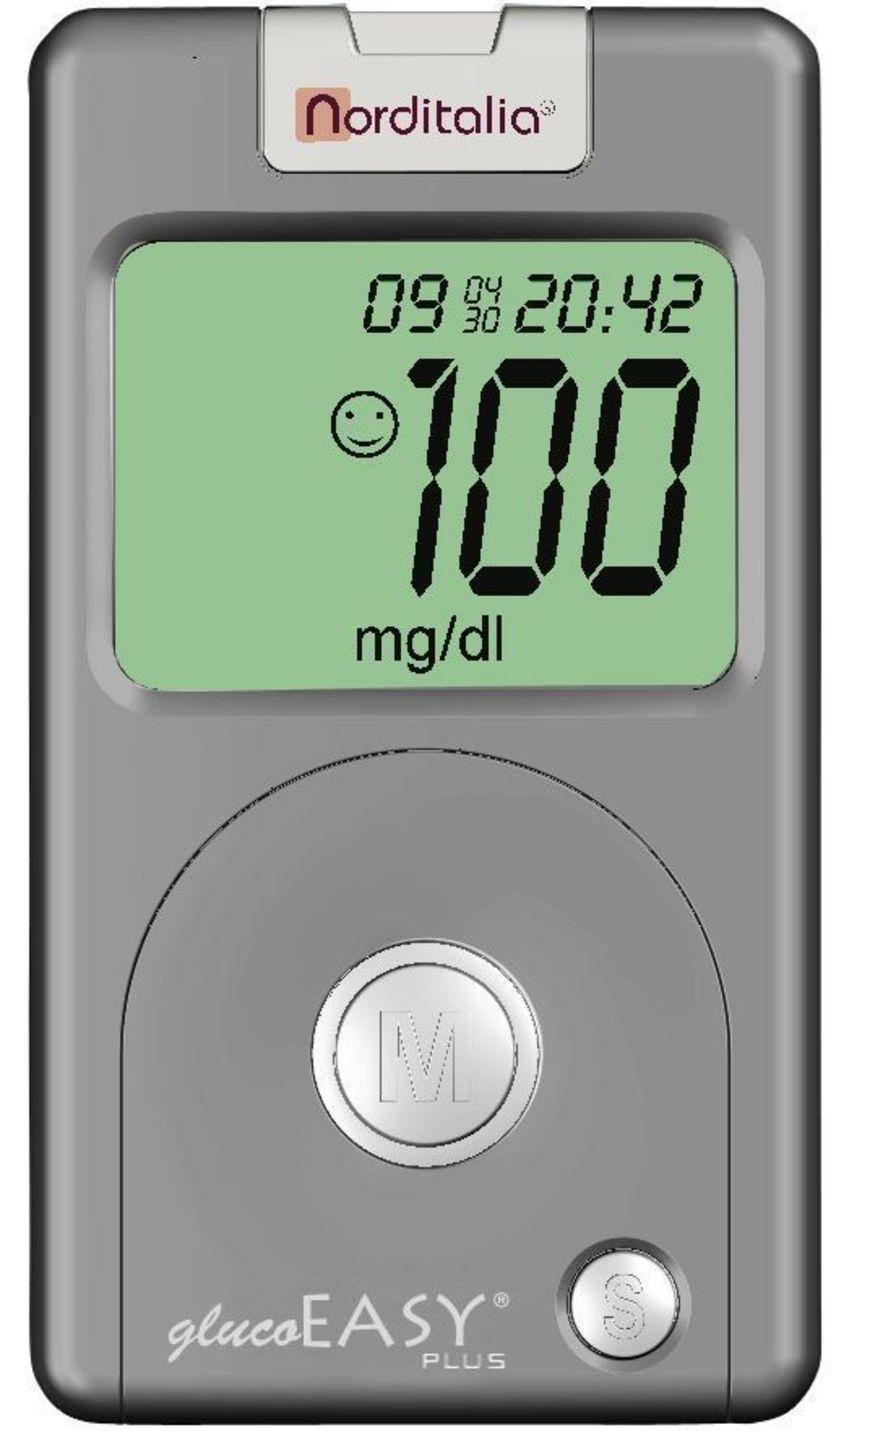 Blood glucose meter 20 - 600 mg / dL | glucoEASY Plus Norditalia Elettromedicali